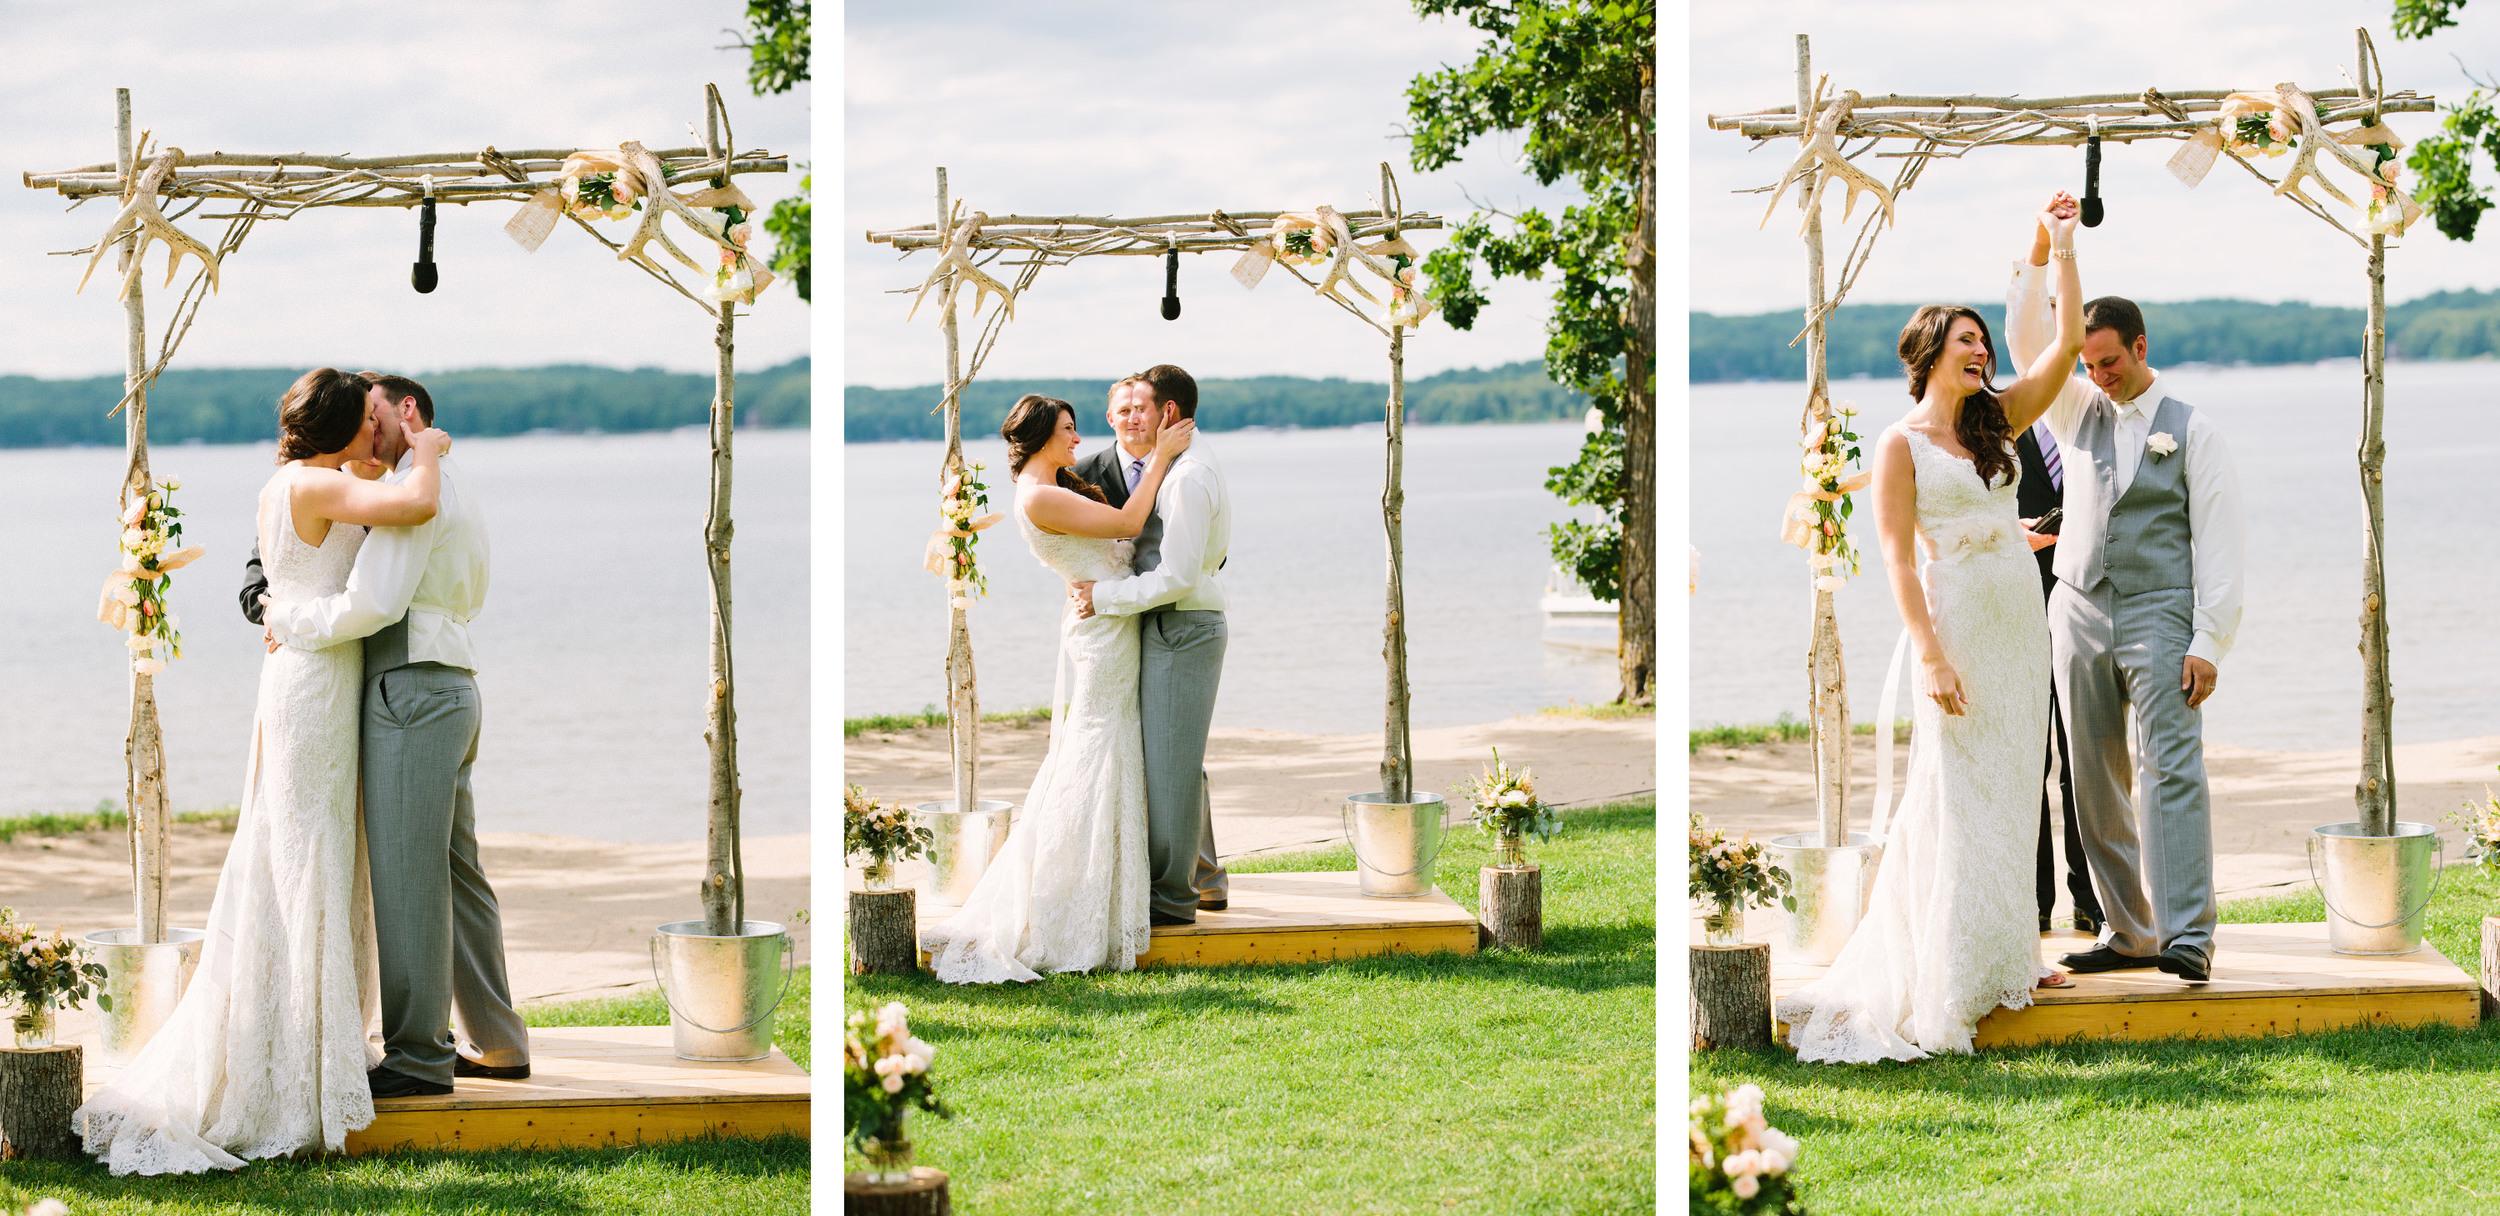 Minnesota summer beach wedding on Gull Lake at Madden's Resort